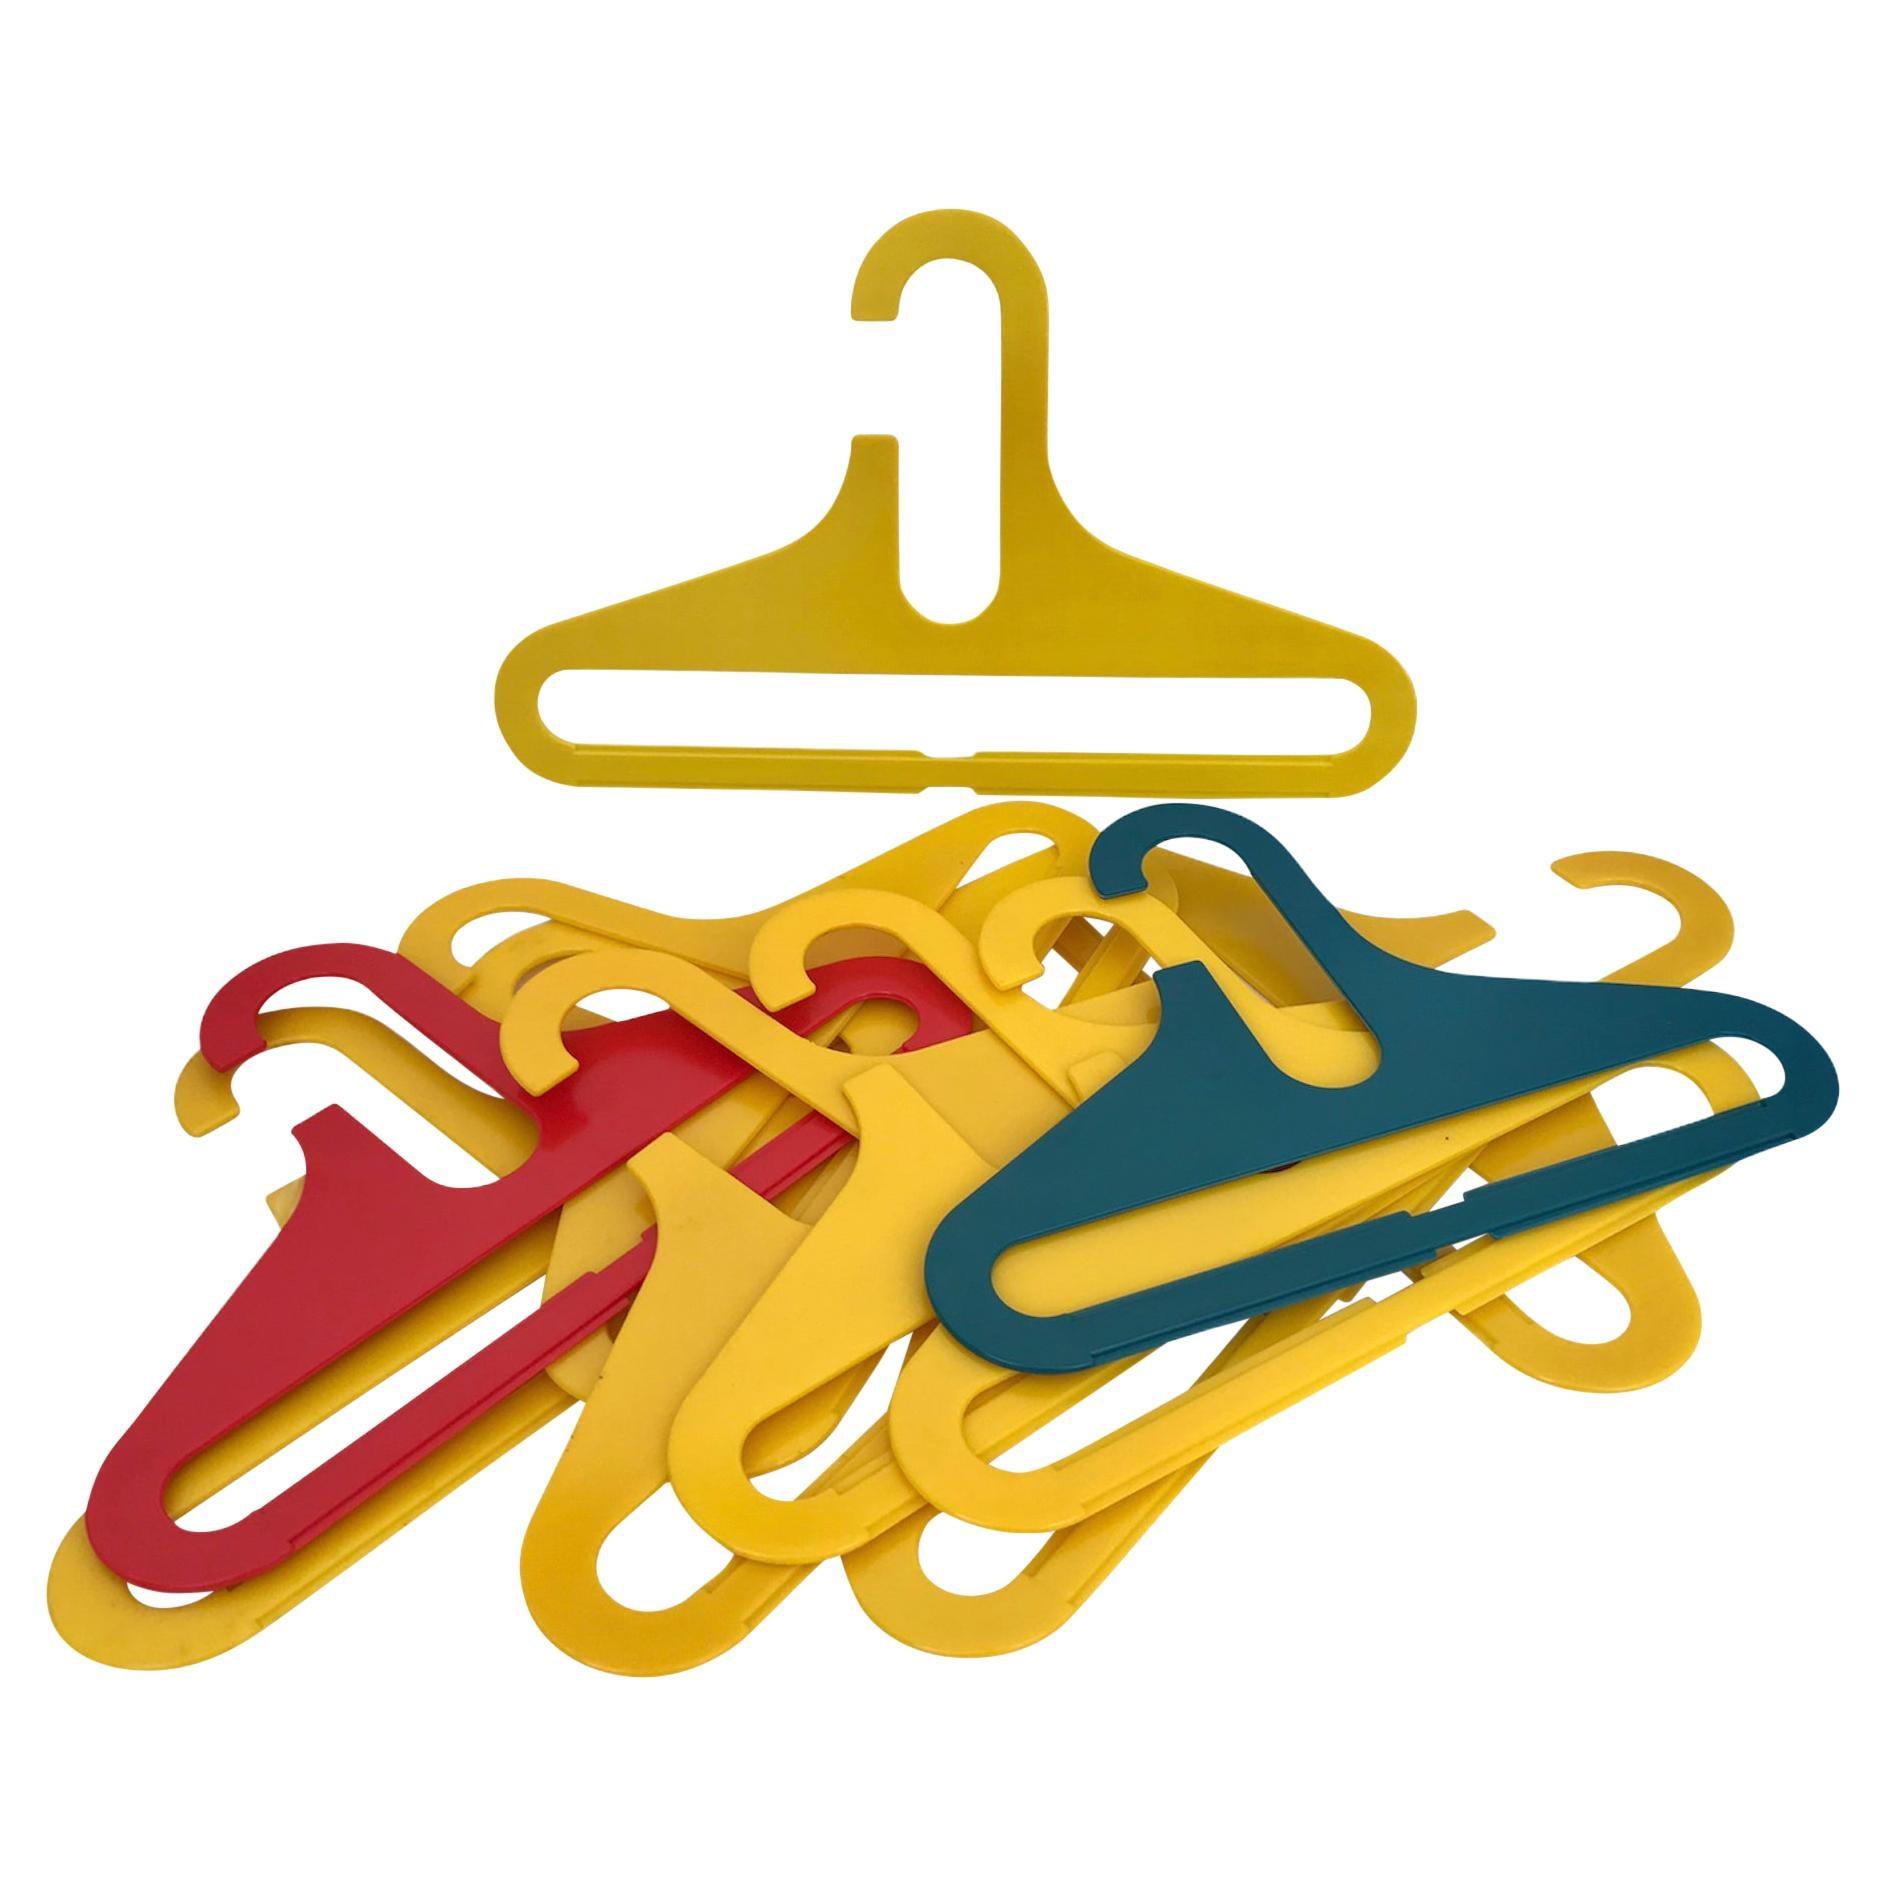 In the Manner Ingo Maurer POP Modern Plastic 11 Children's Clothes Hangers 1970s